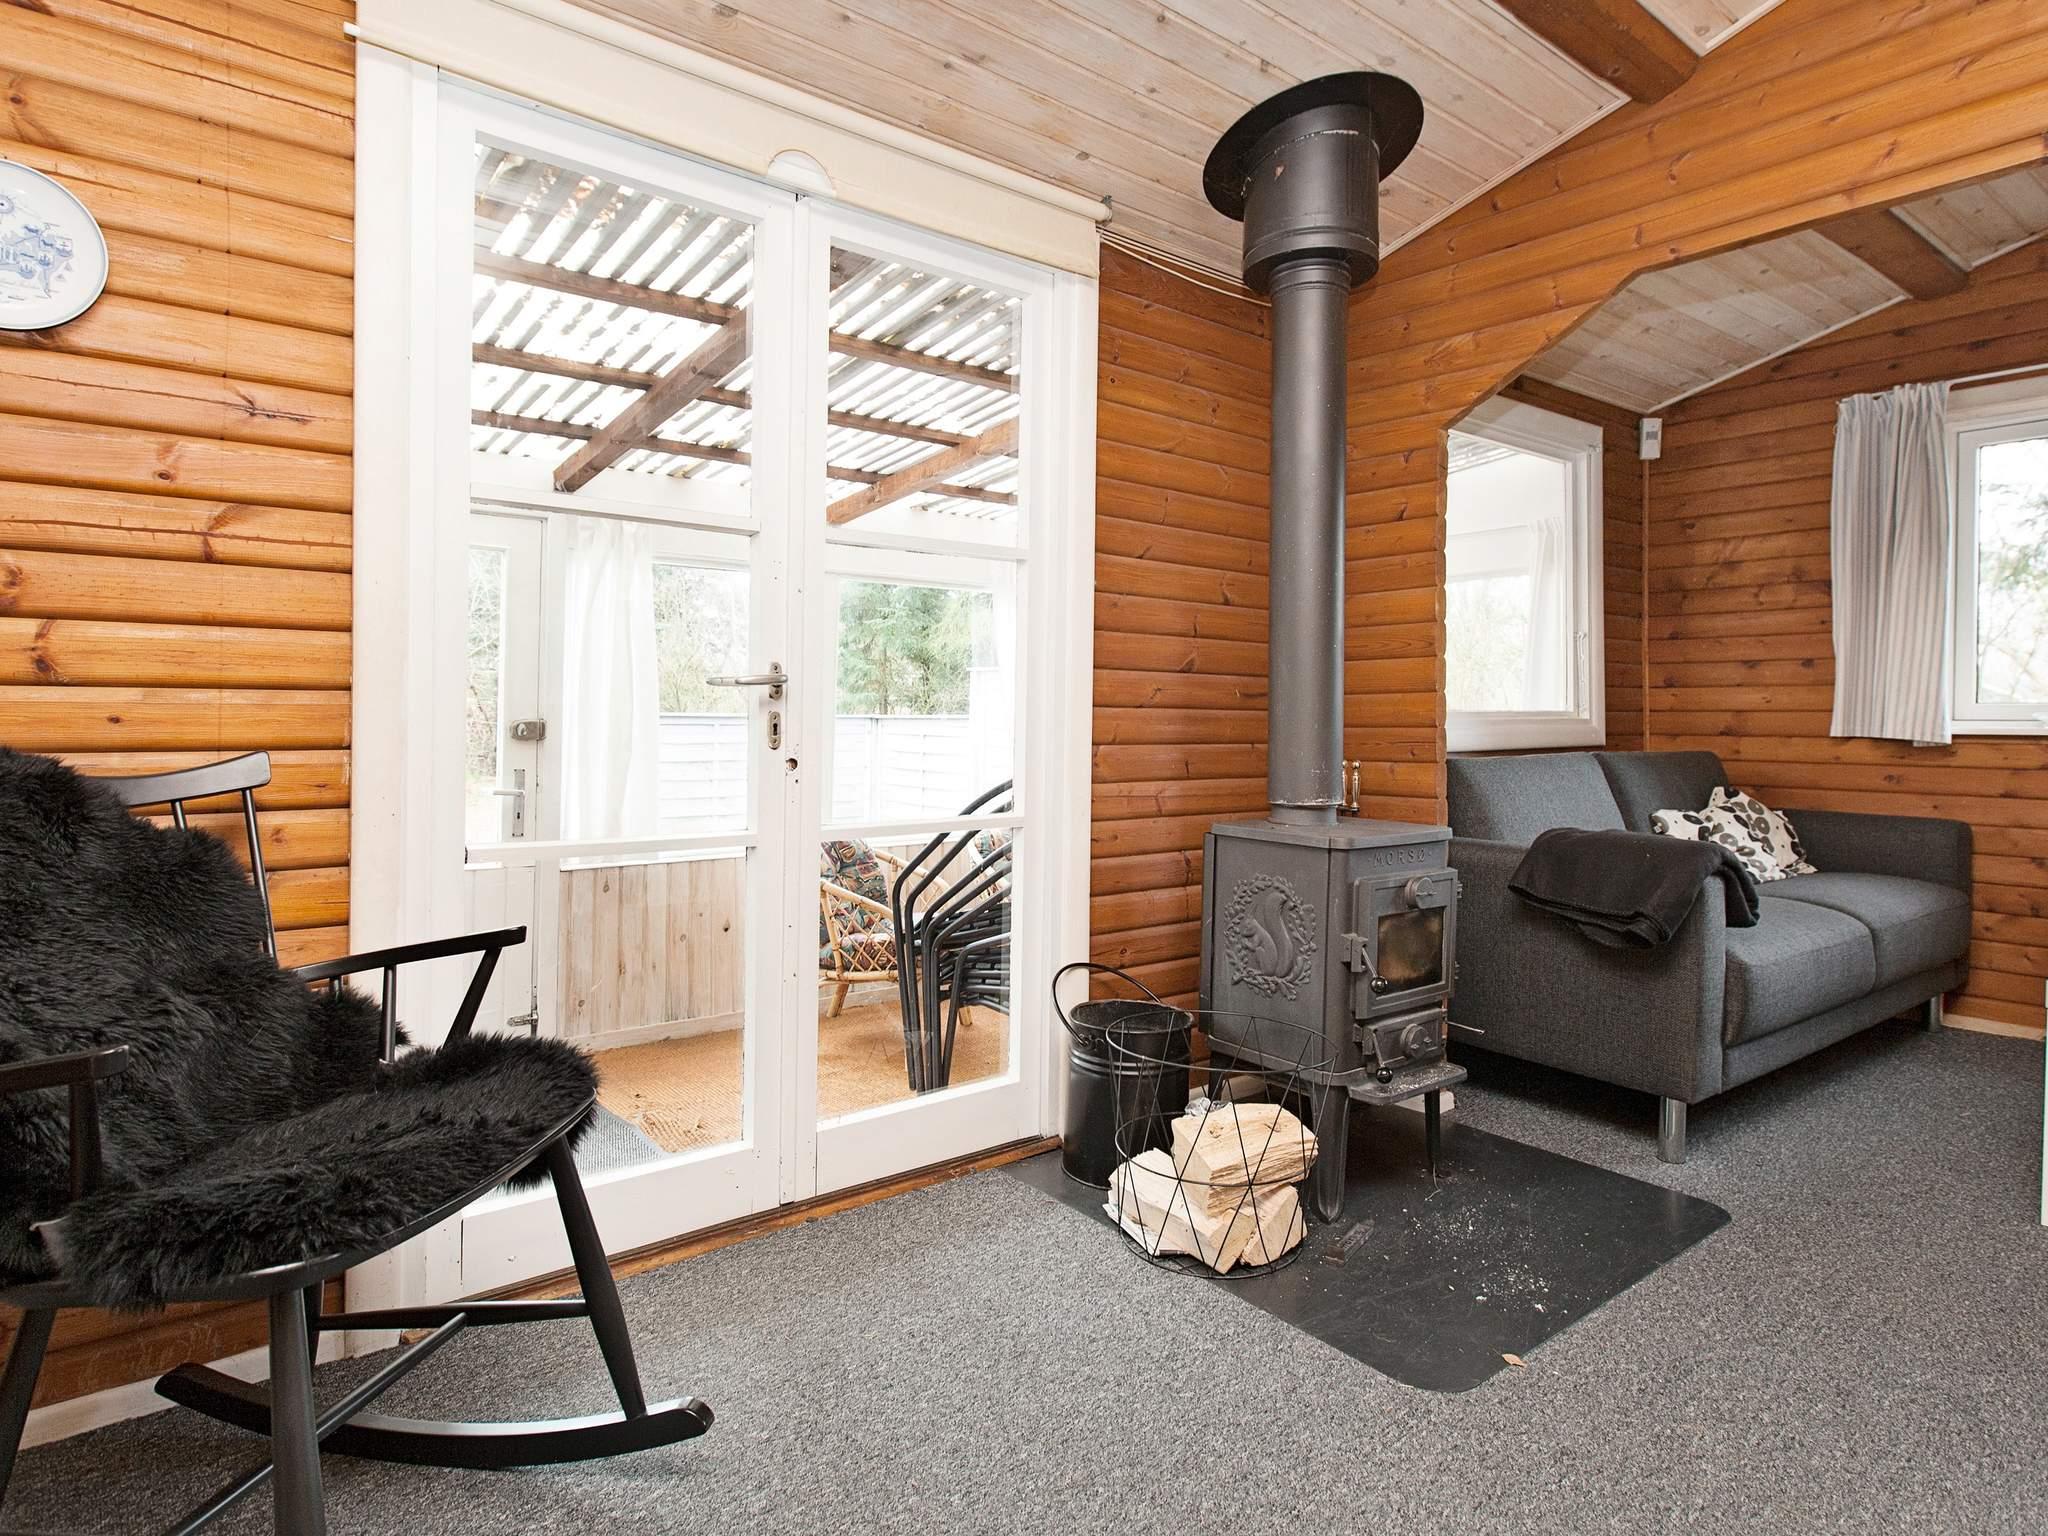 Maison de vacances Kramnitze (87262), Kramnitse, , Lolland, Danemark, image 13